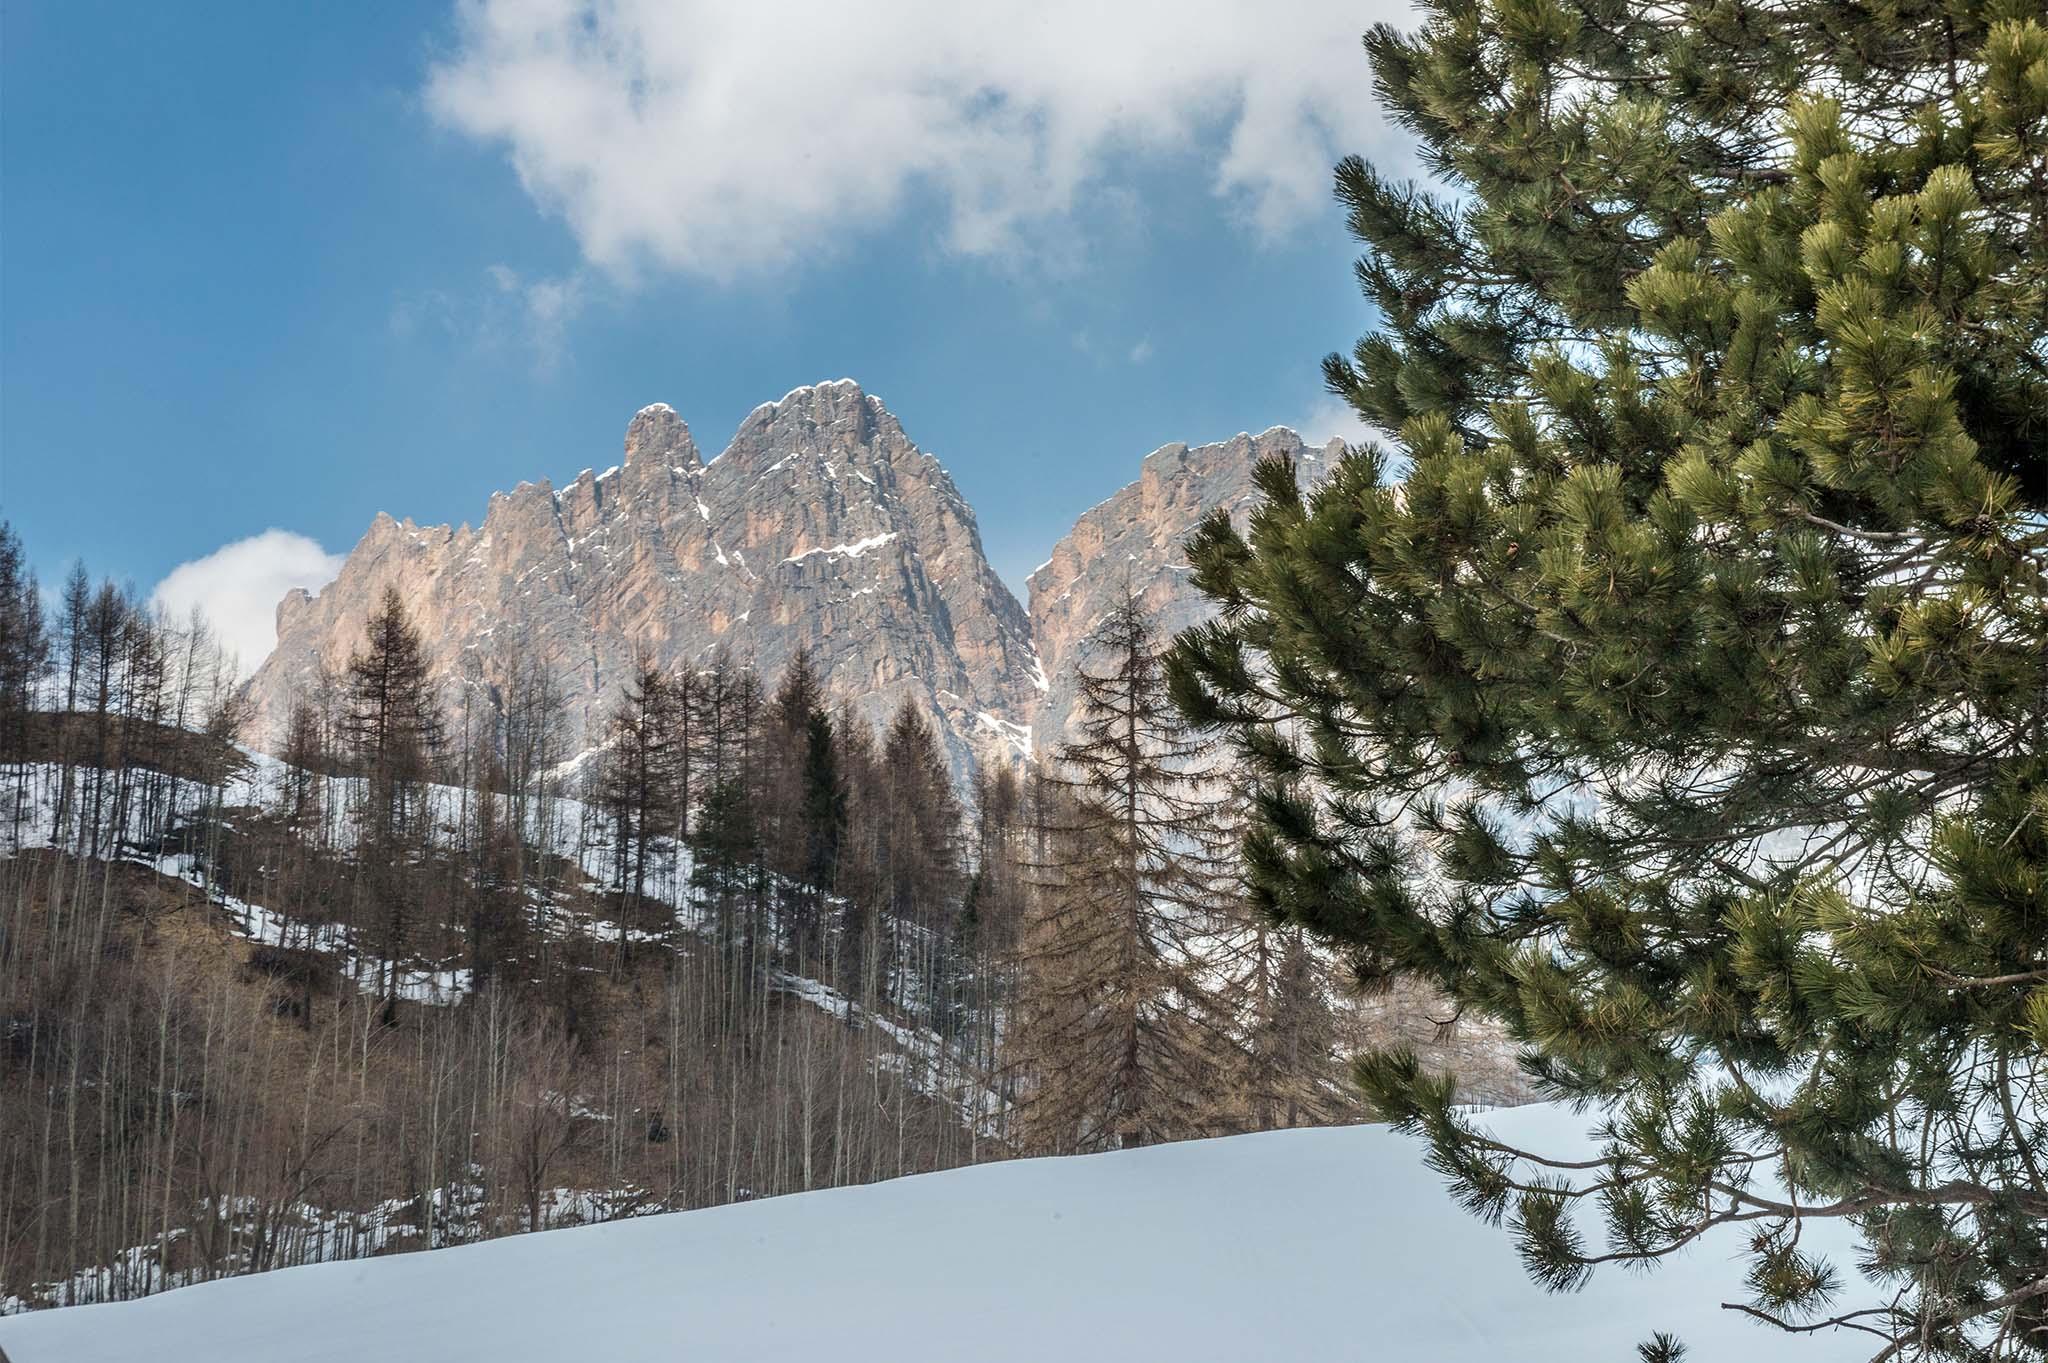 Castelli, Chalet e Baite in vendita Dolomiti | Sotheby's Realty - sothebys.photo 1